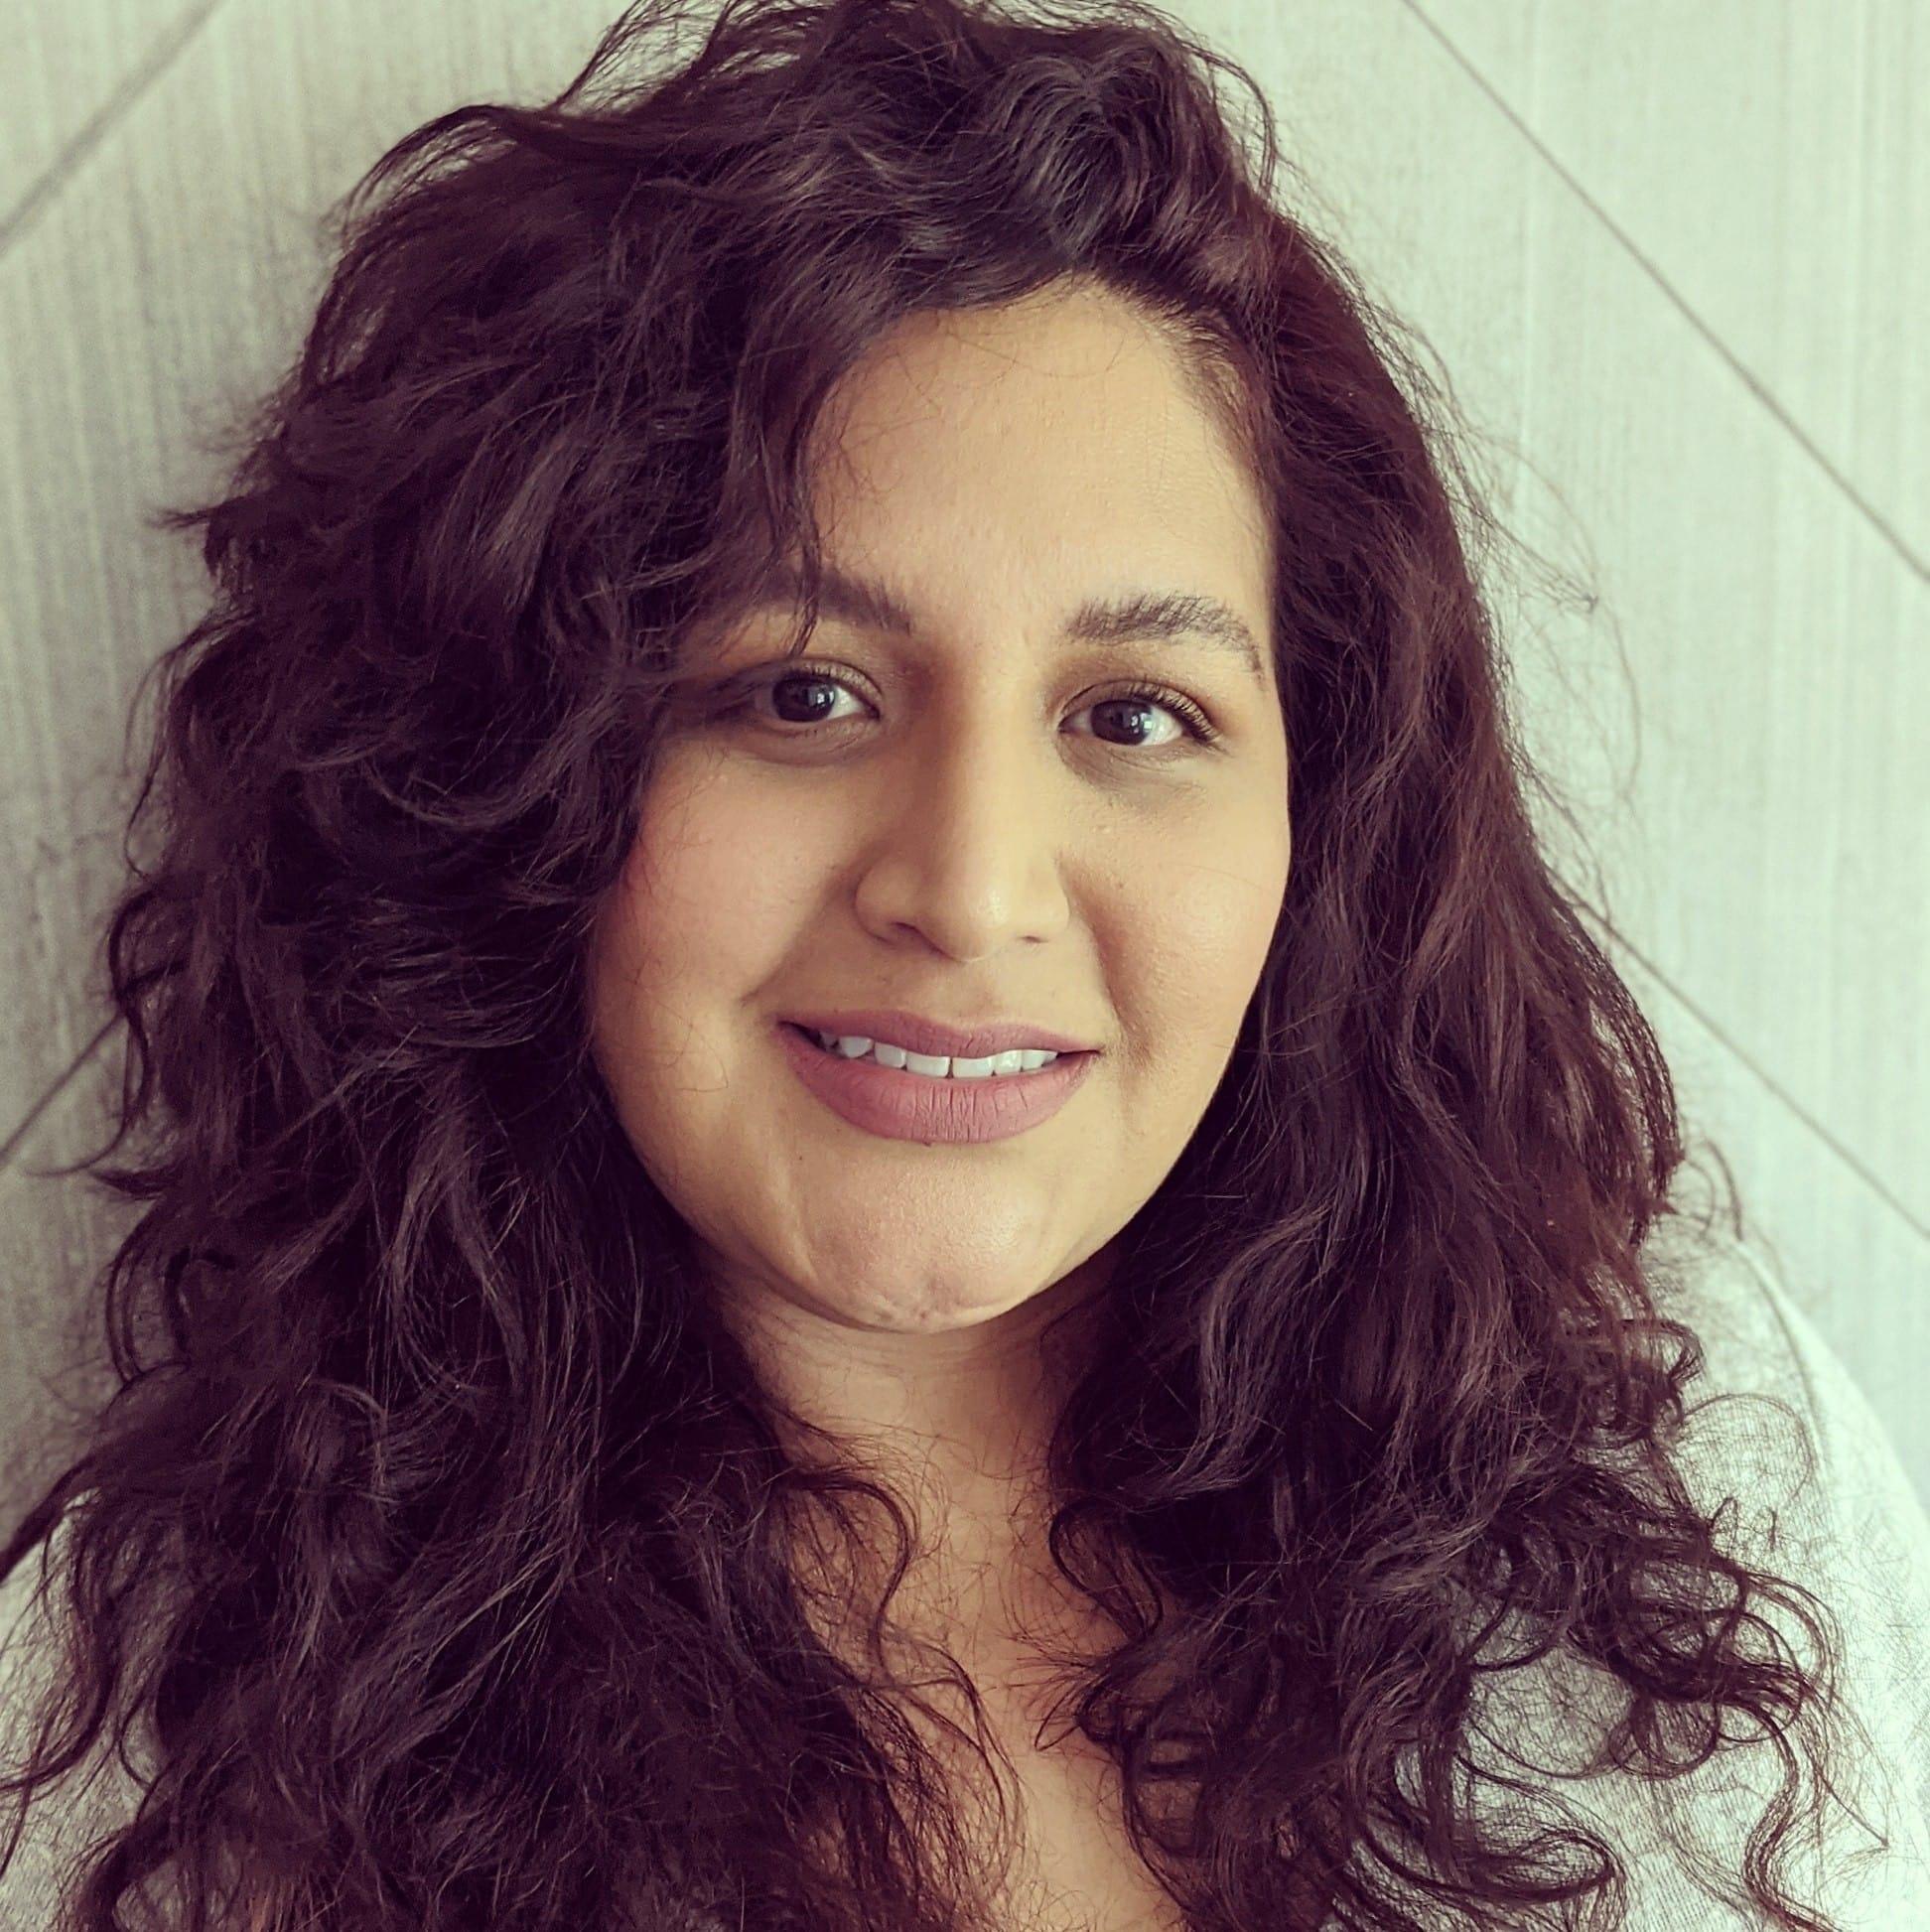 Claudia Calero-Osborn; Supervised by Dr. Chris Stravitsch, DMin, LPC-S, LMFT-S